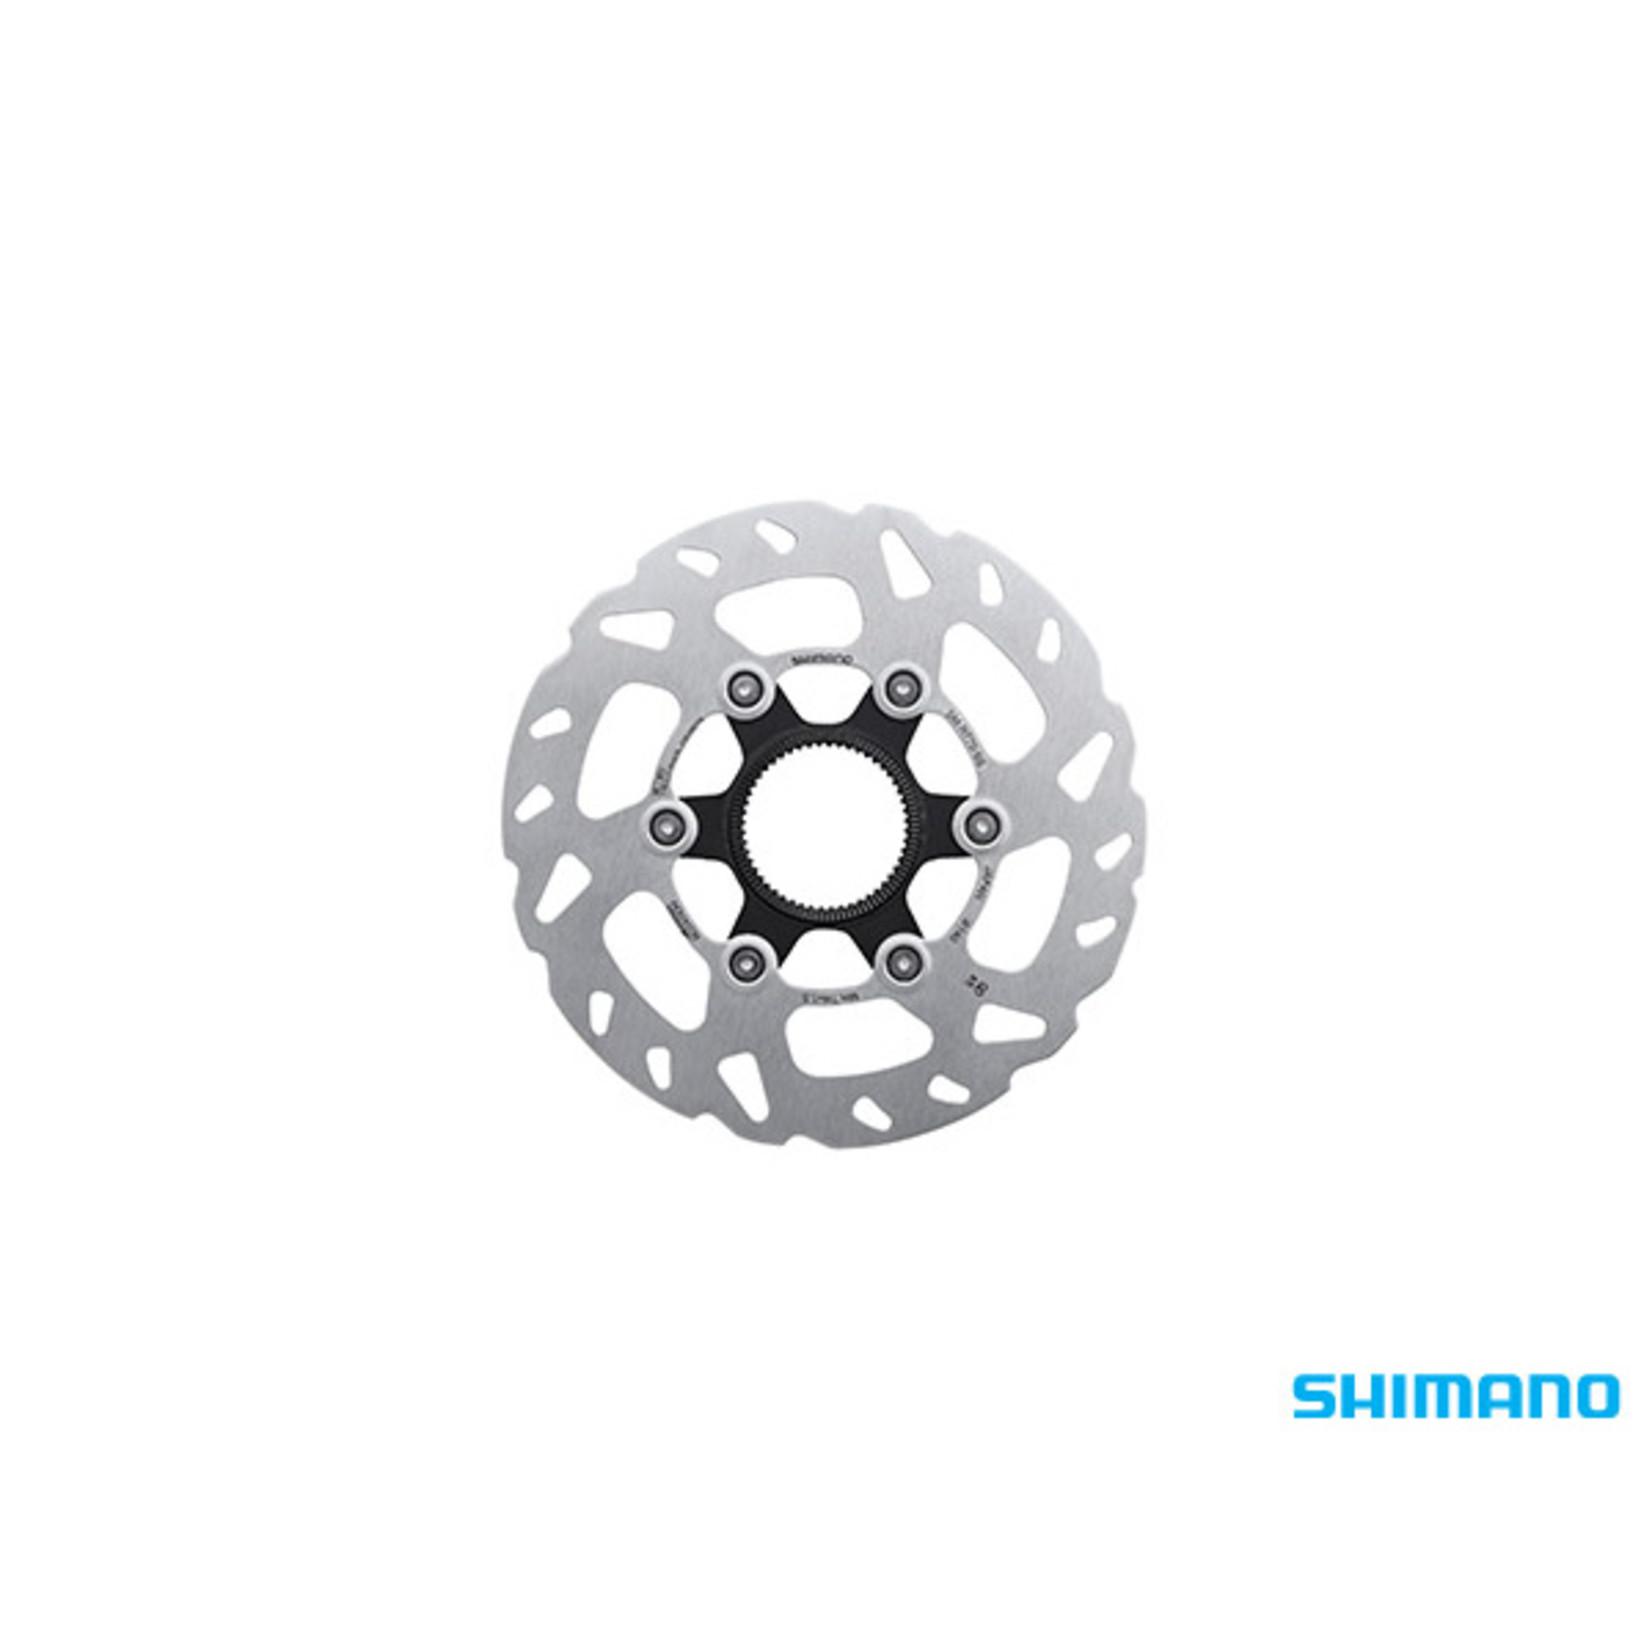 Shimano Shimano, SM-RT70 Disc Rotor 140mm 105/SLX Centerlock